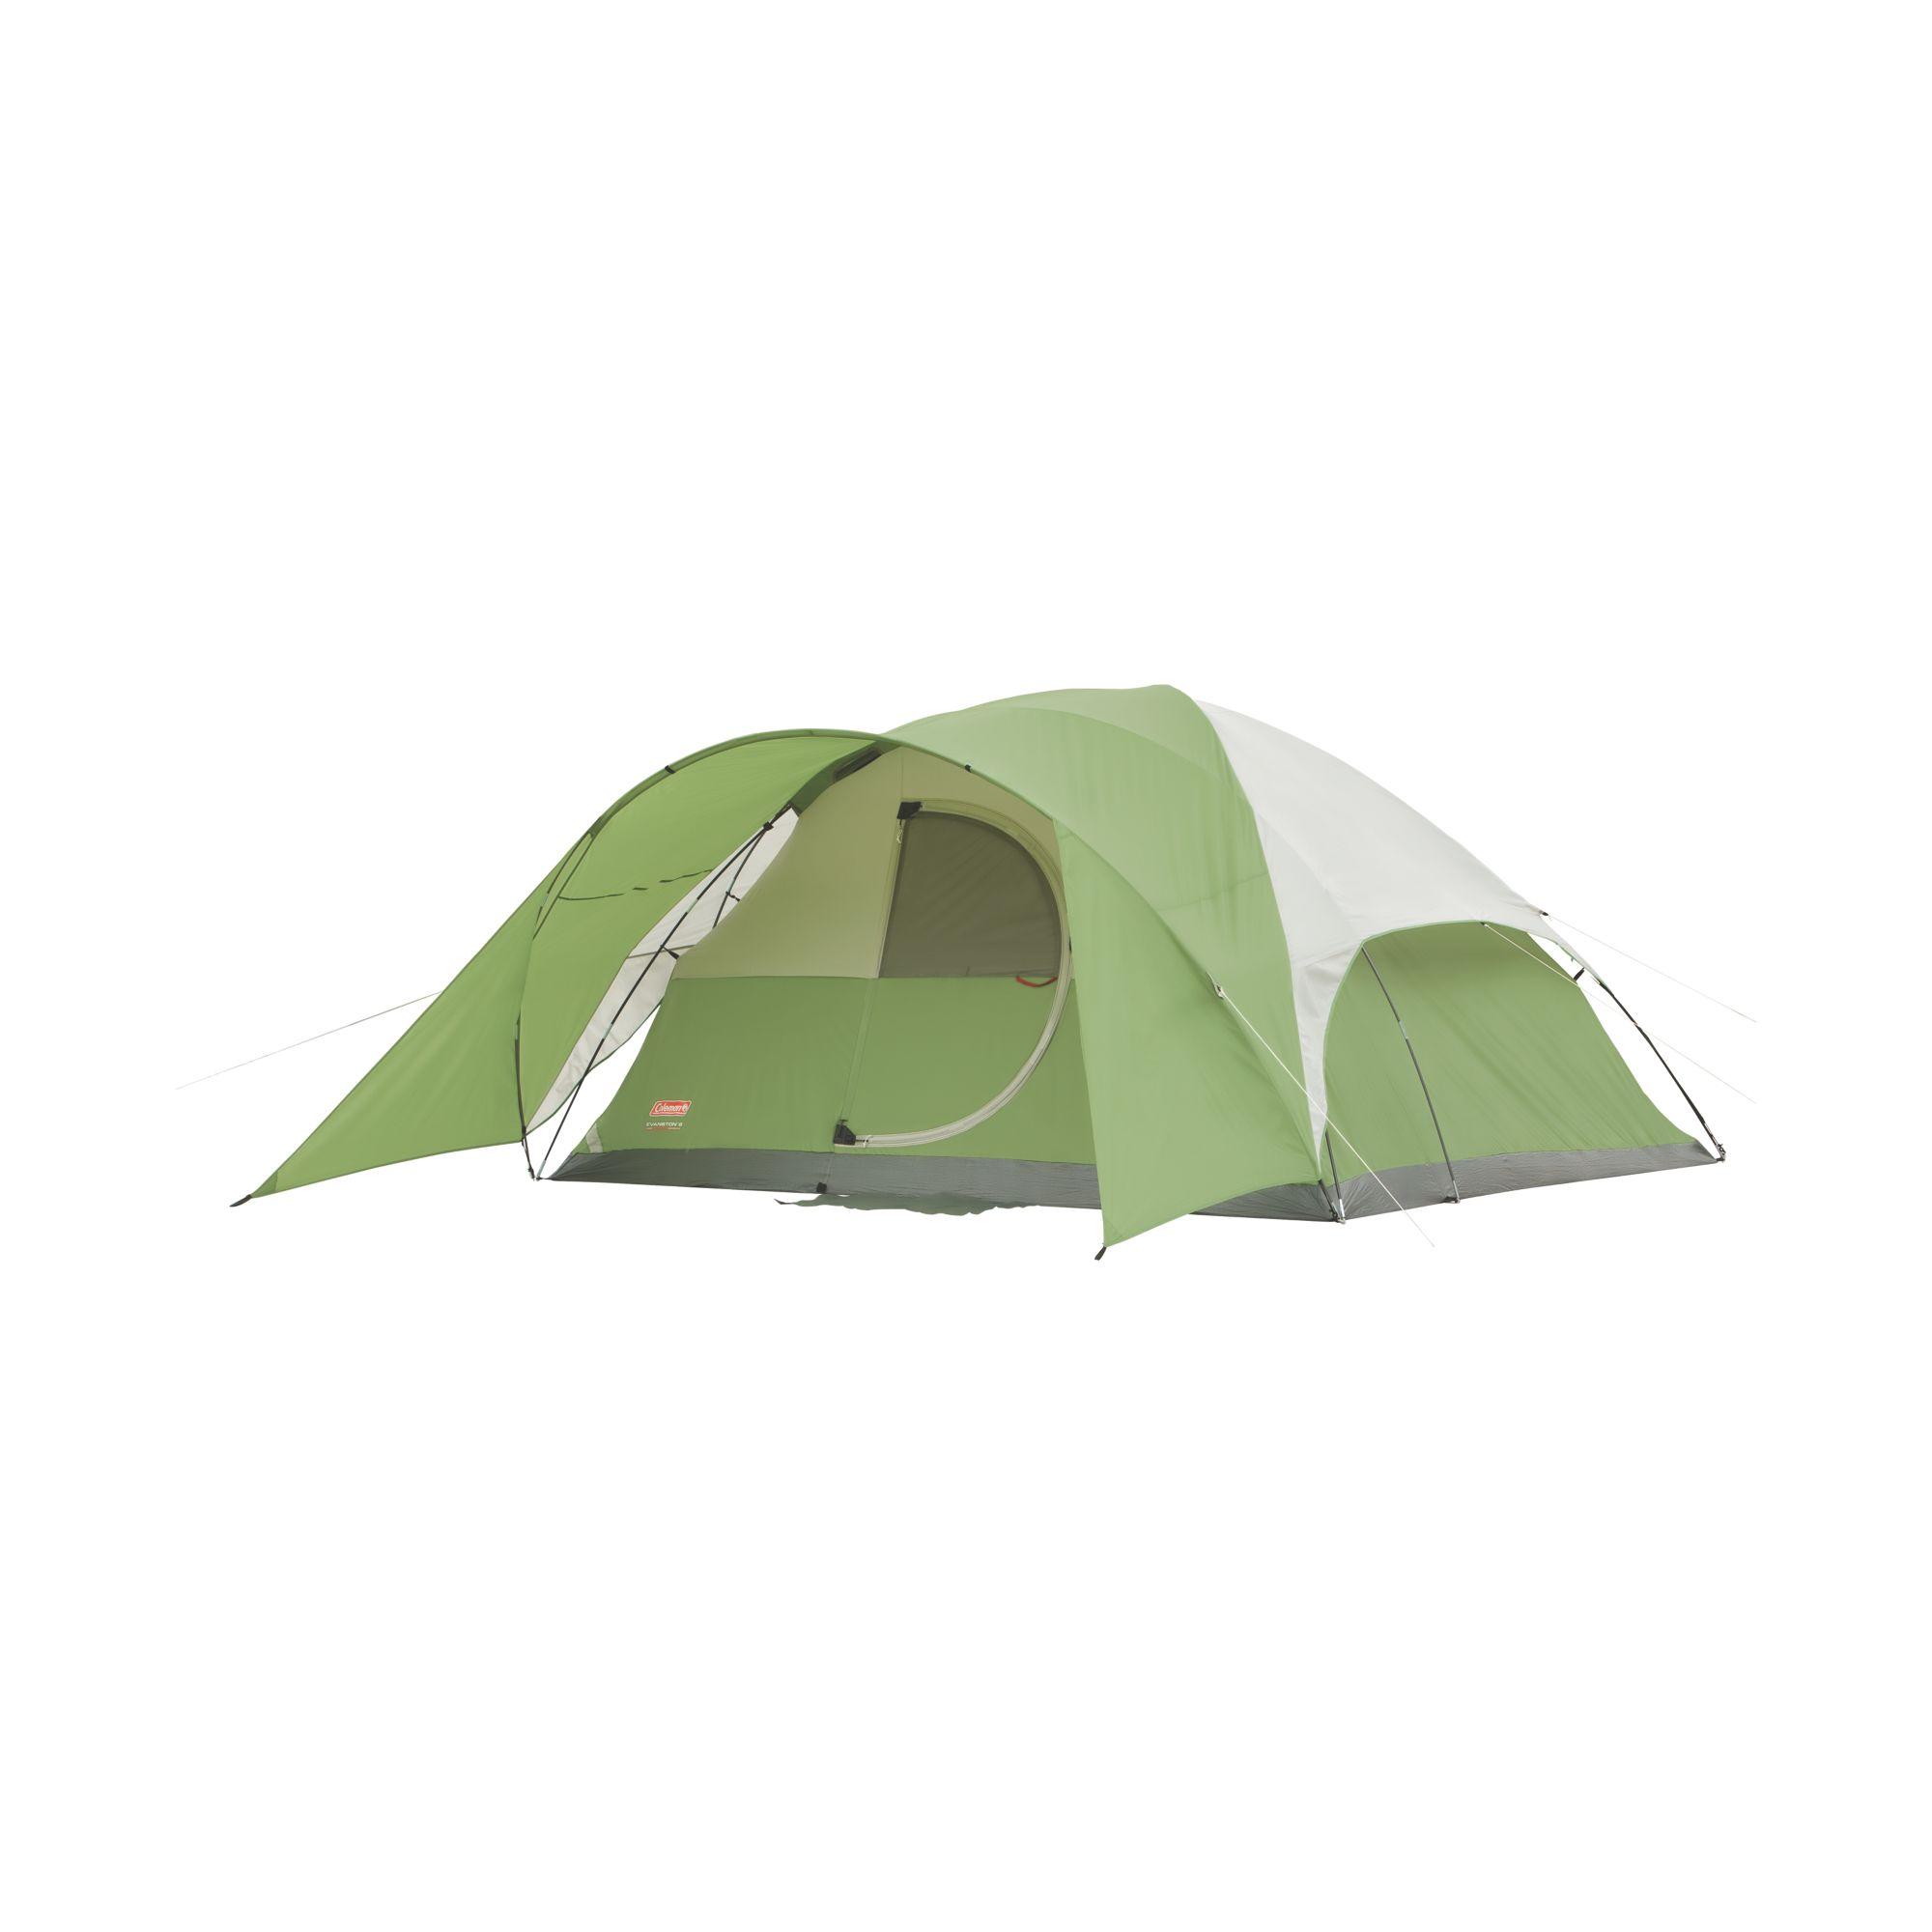 Evanston 8 person tent coleman evanston 8 person tent sciox Choice Image